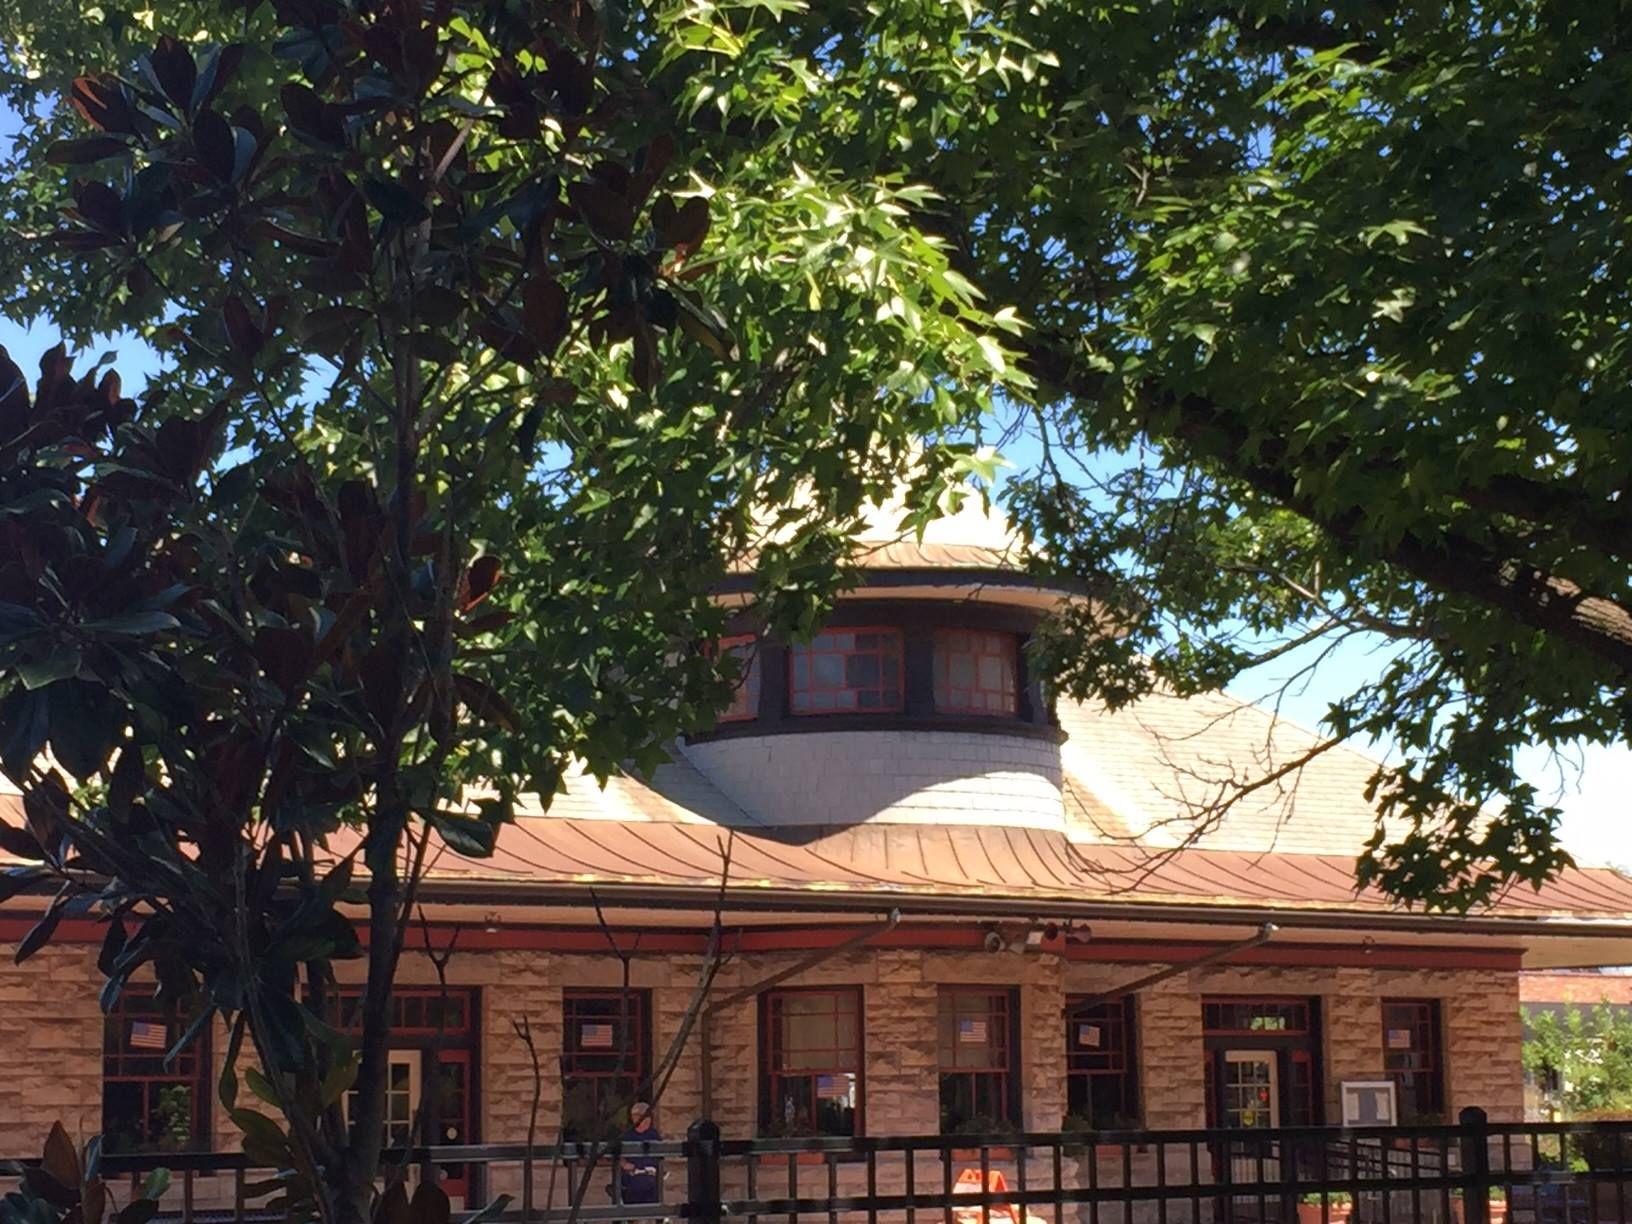 Our beloved Kirkwood train station, still served by Amtrak. Photo via the City of Kirkwood's web site.